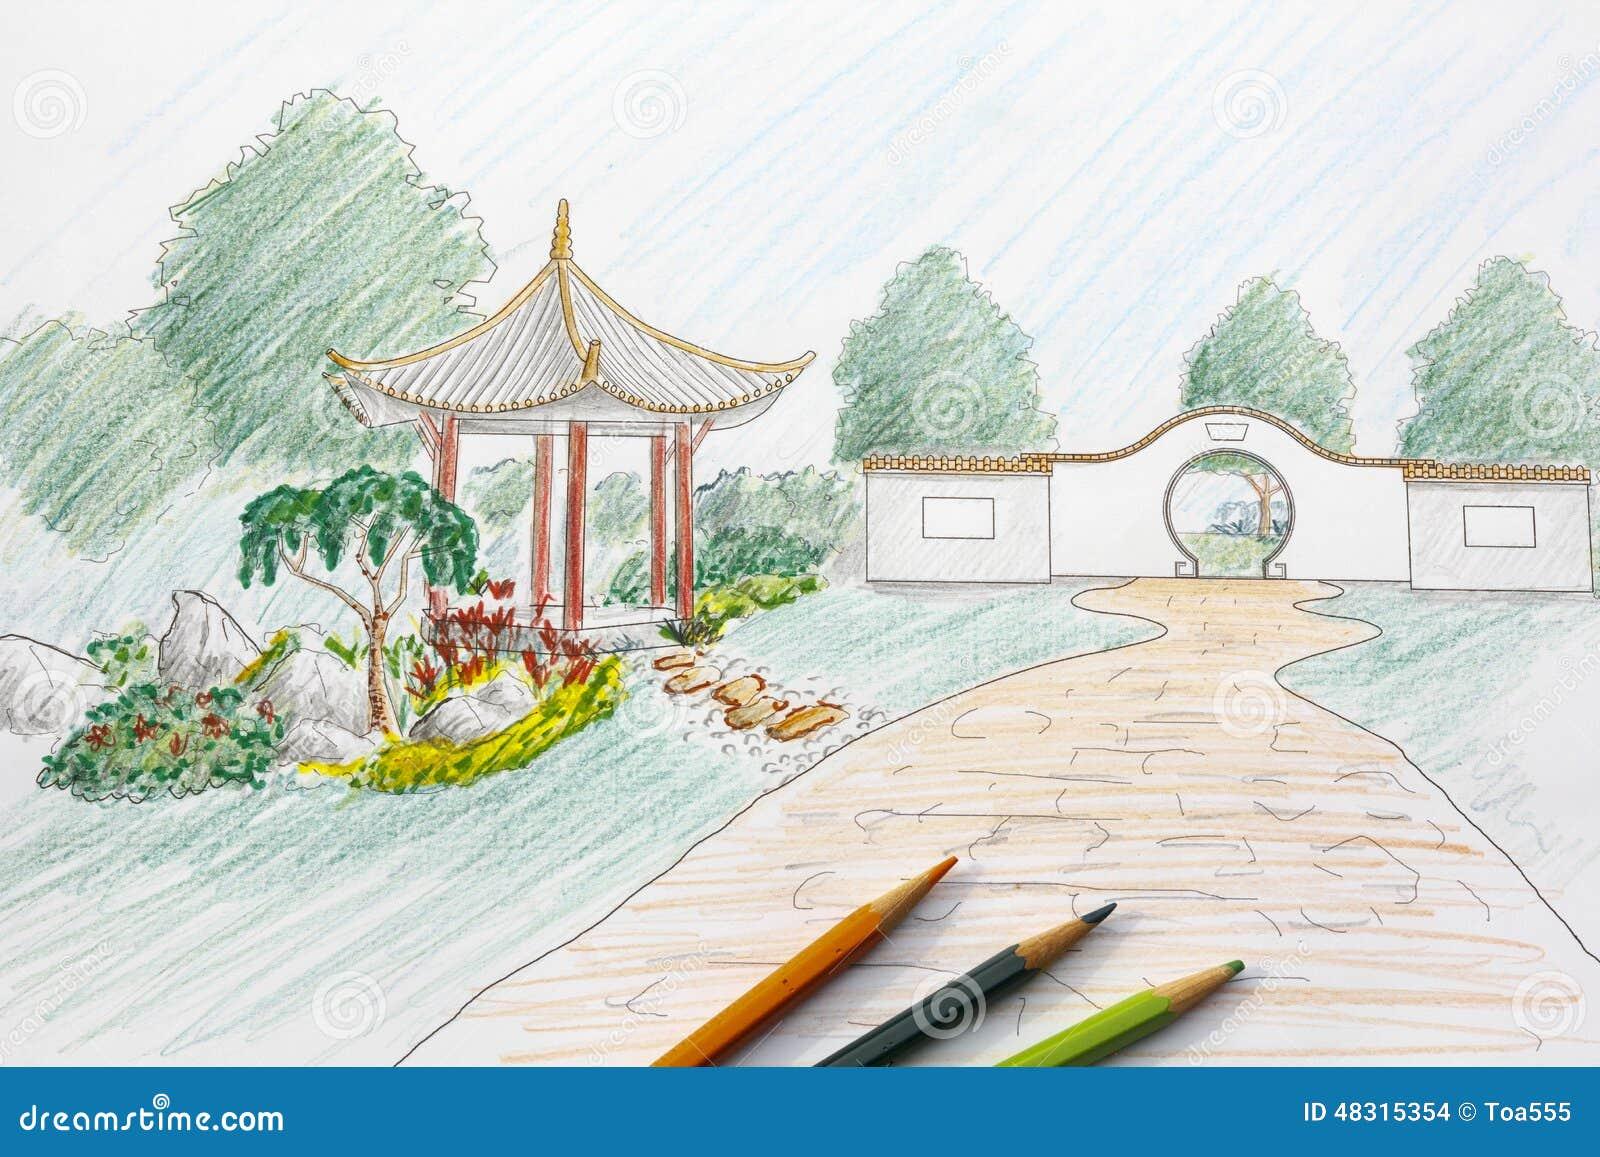 Chinese garden design - Landscape Architect Design Chinese Garden Plan Stock Images